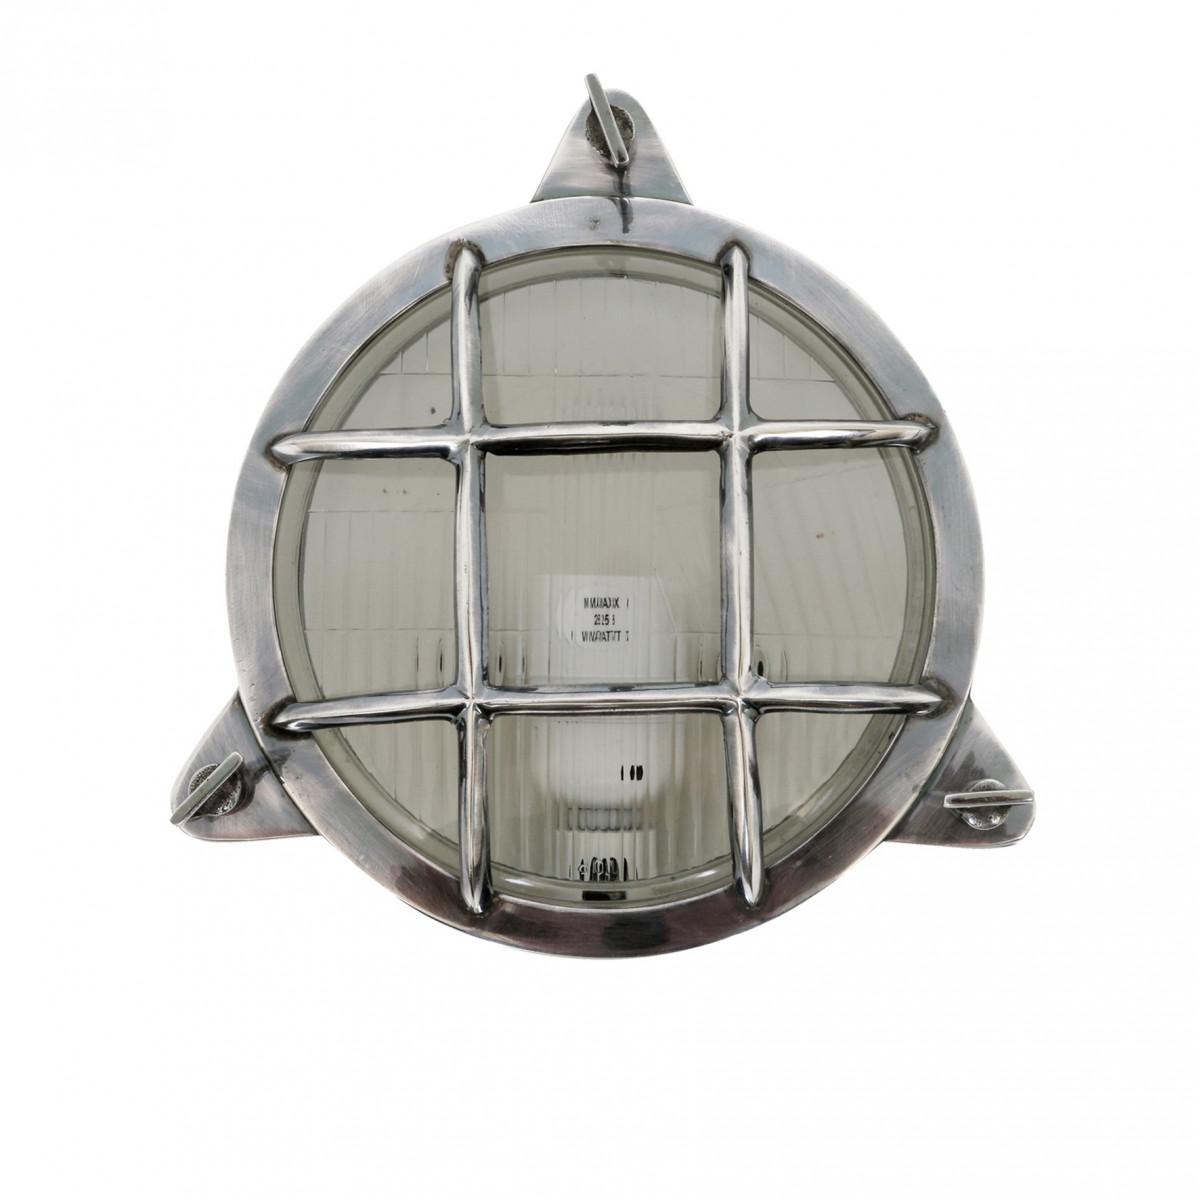 muur/plafond lamp Clipper antiek zilver